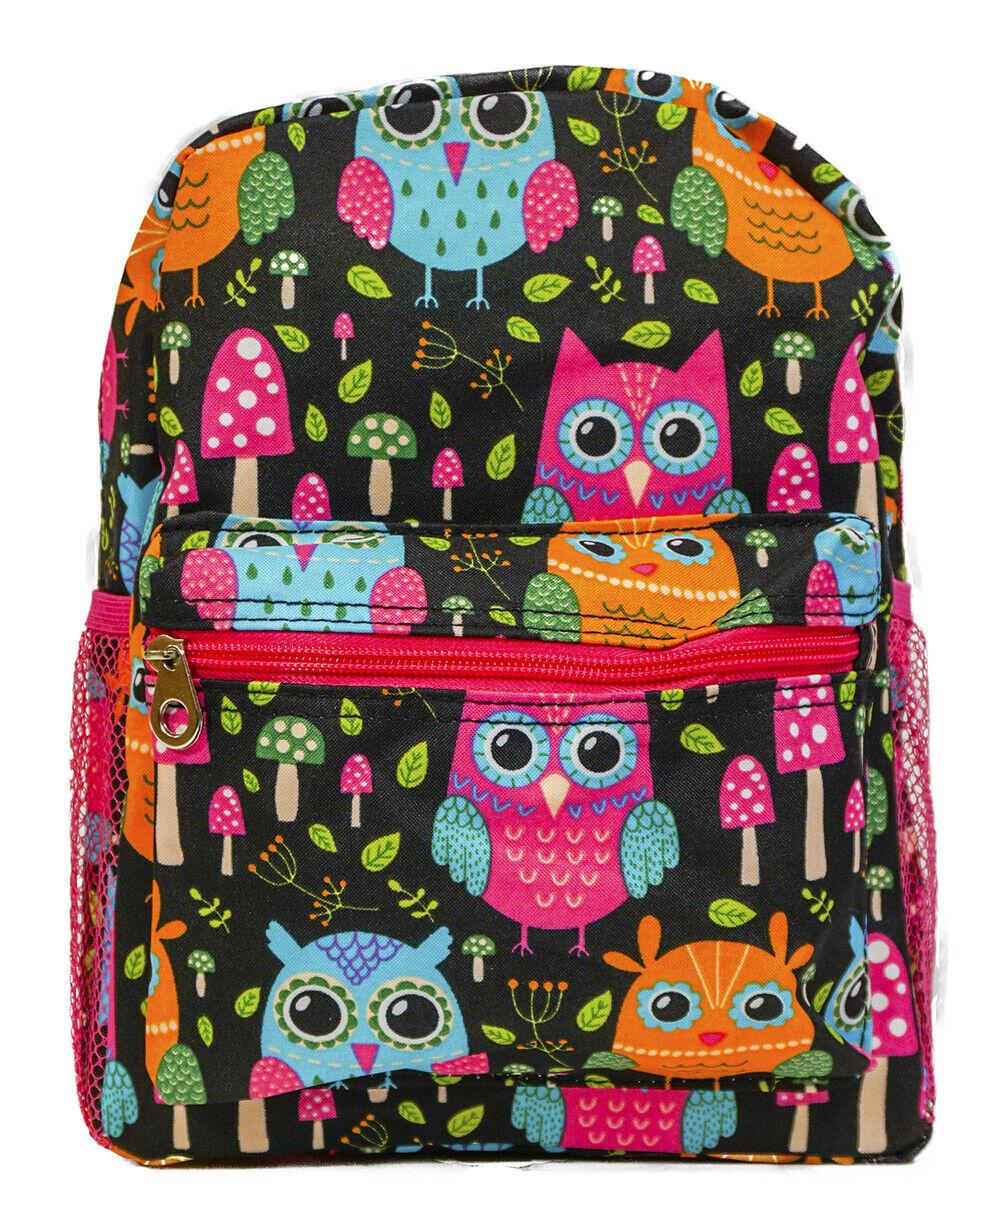 Girls Cute Owl Mini Toddler Backpack Bag For Preschool Kinde